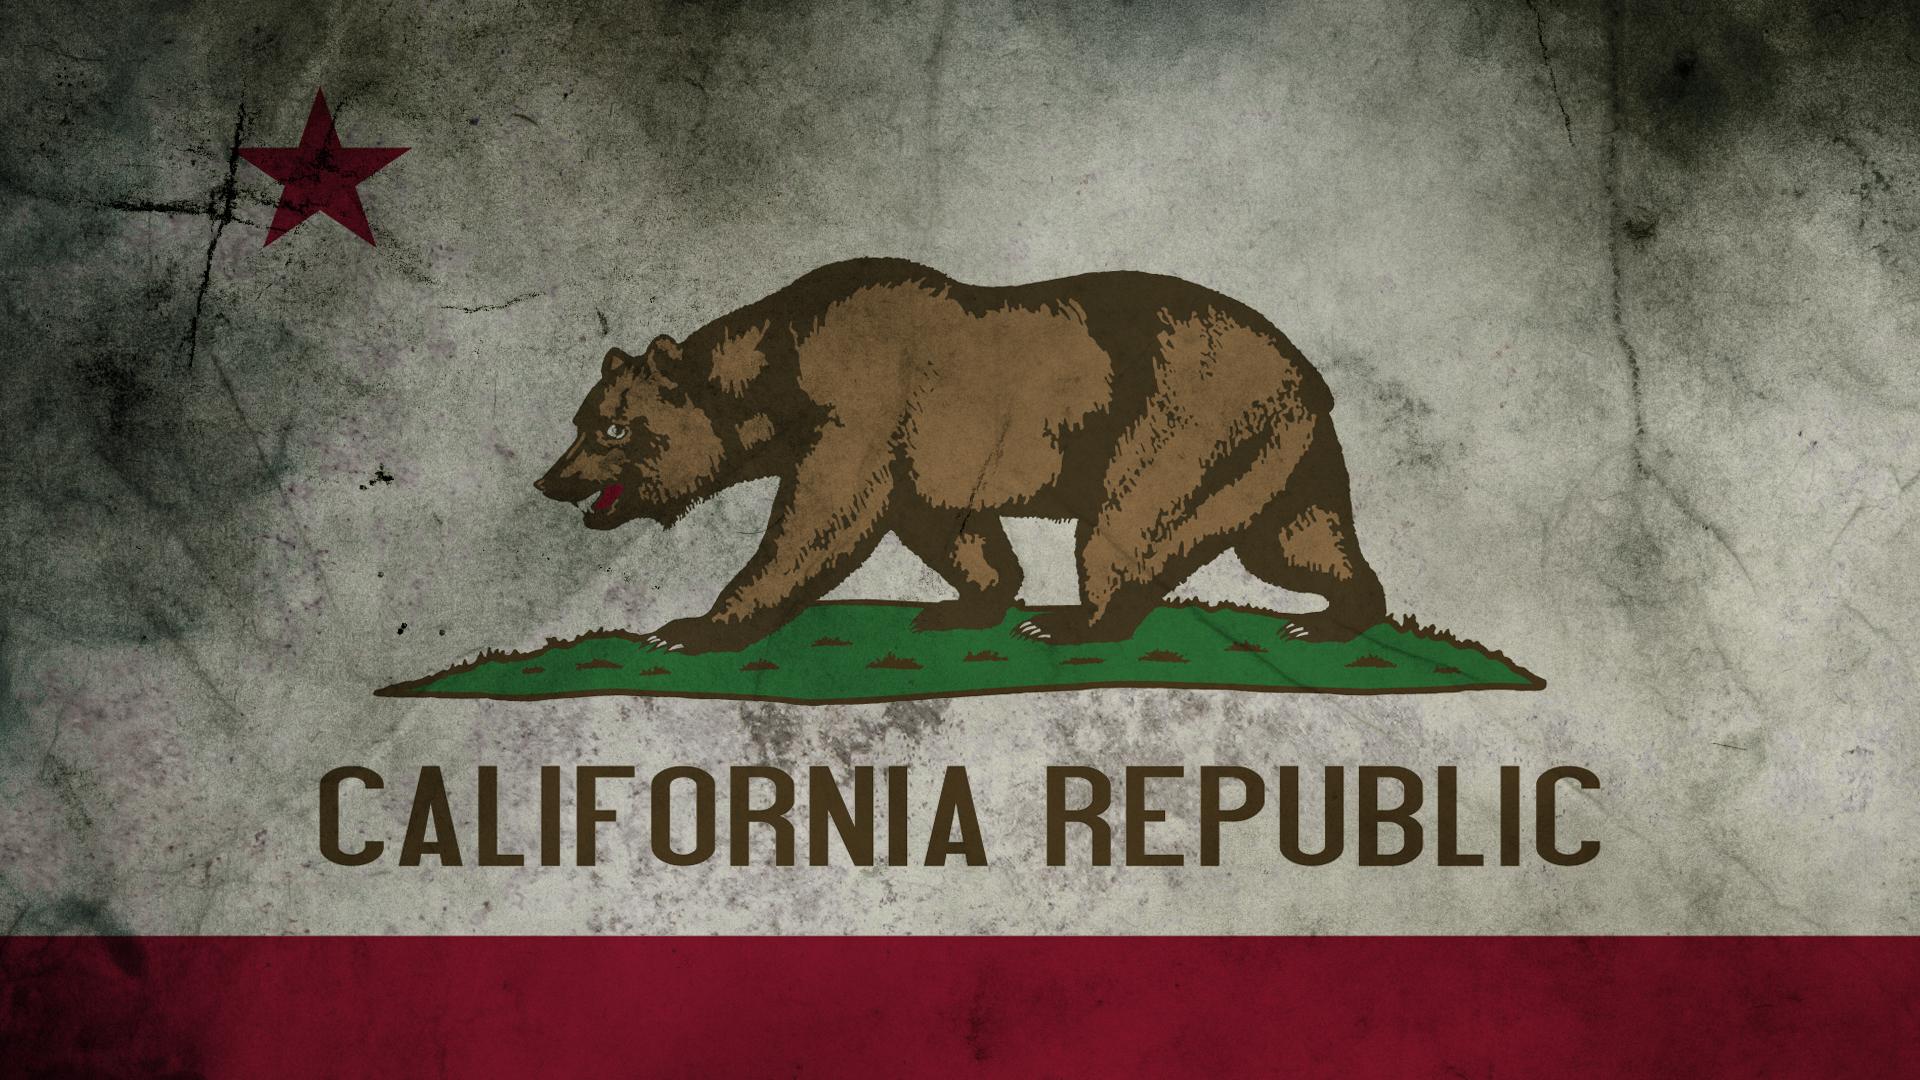 California Republic 1920x1080